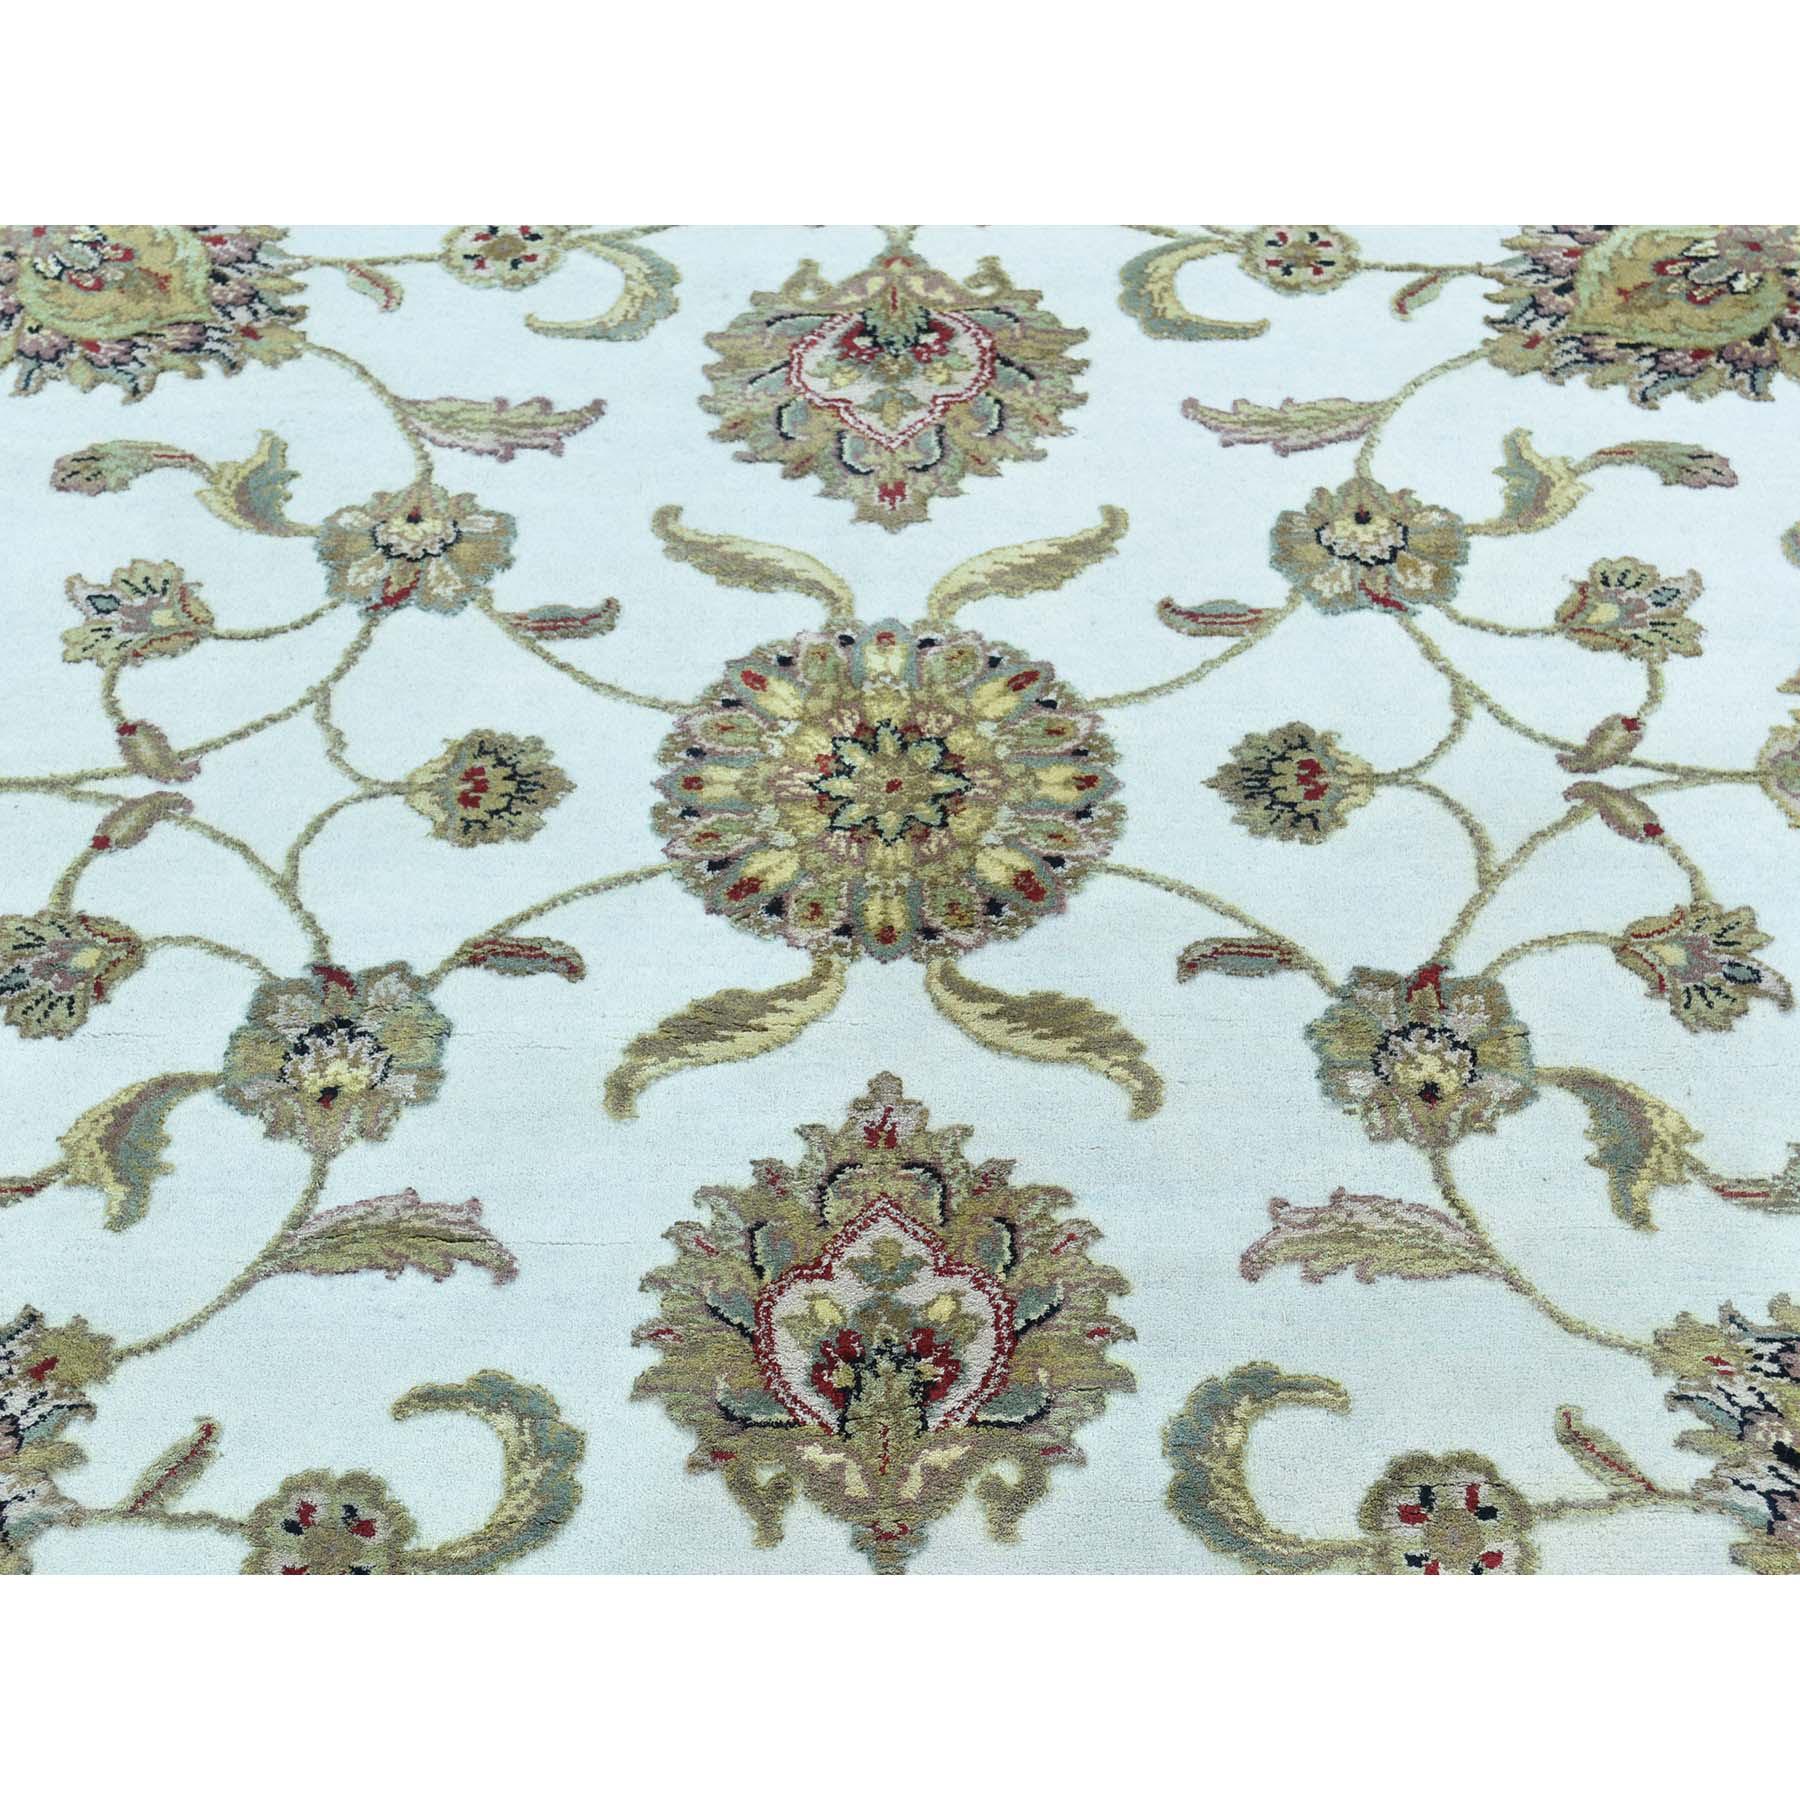 8-x8- Hand-Knotted Round Rajasthan Half Wool And Half Silk Oriental Rug